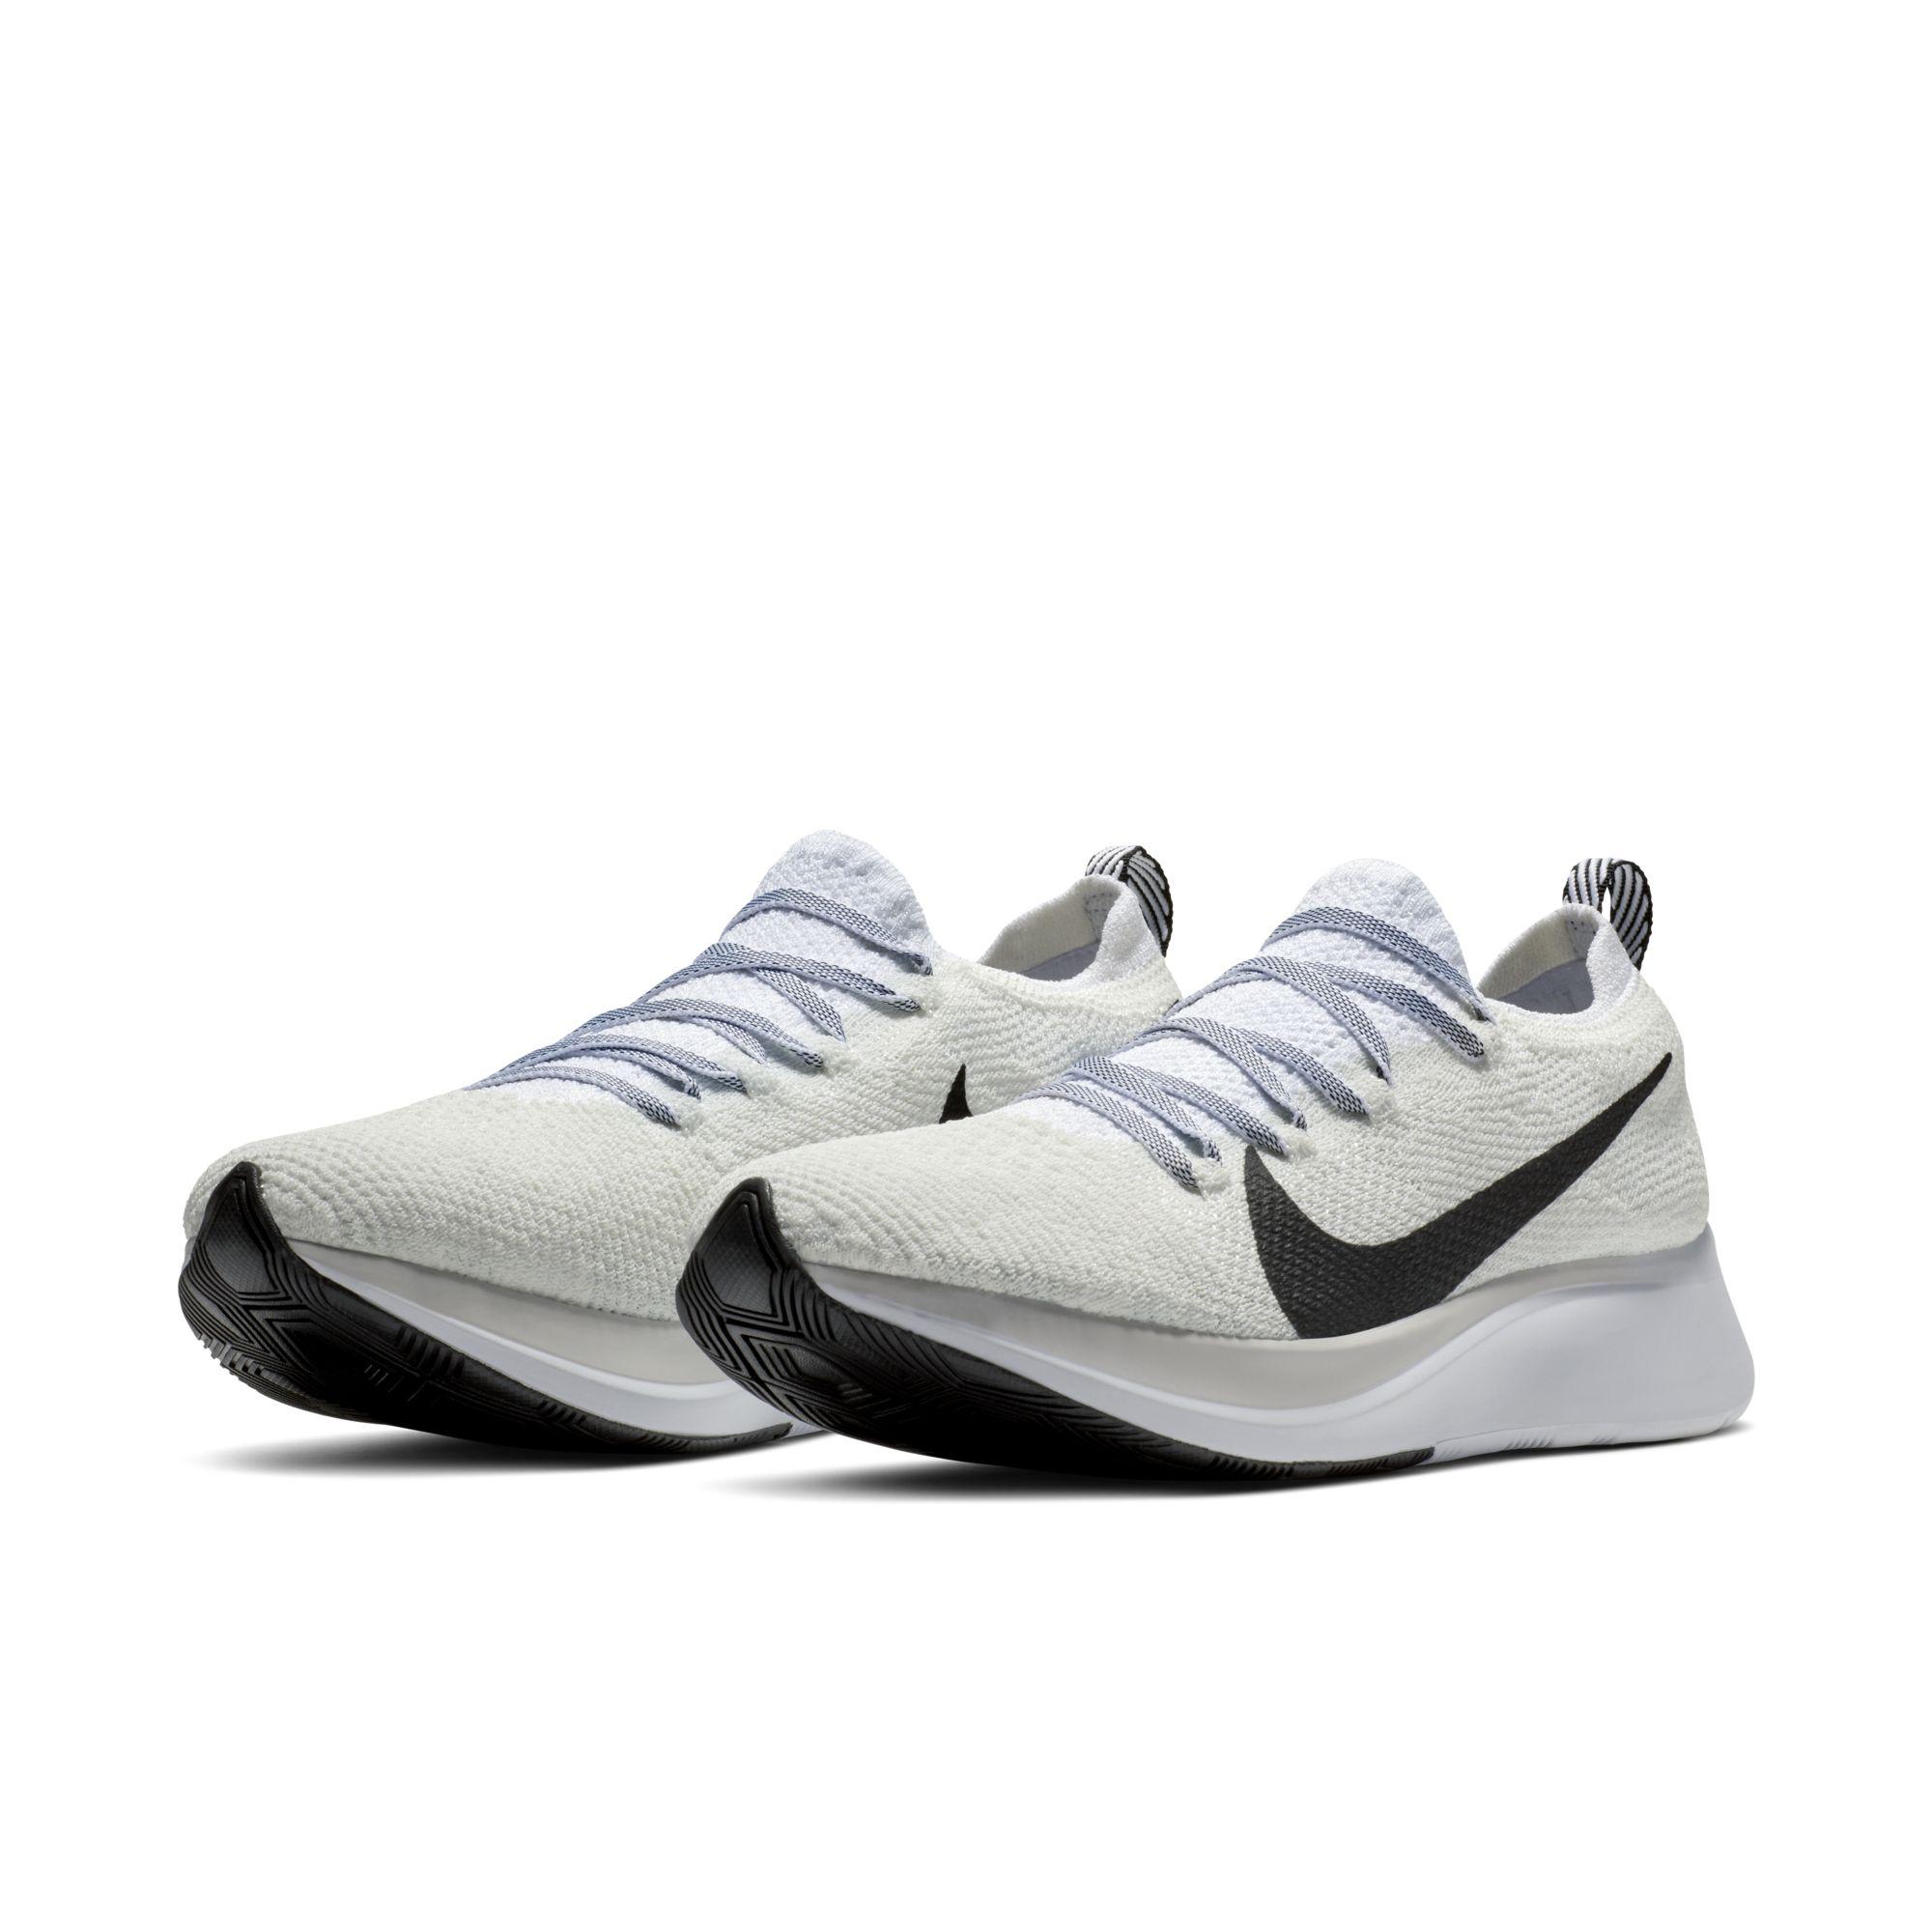 4534ae3e7766 Nike Zoom Vaporfly Elite 2017